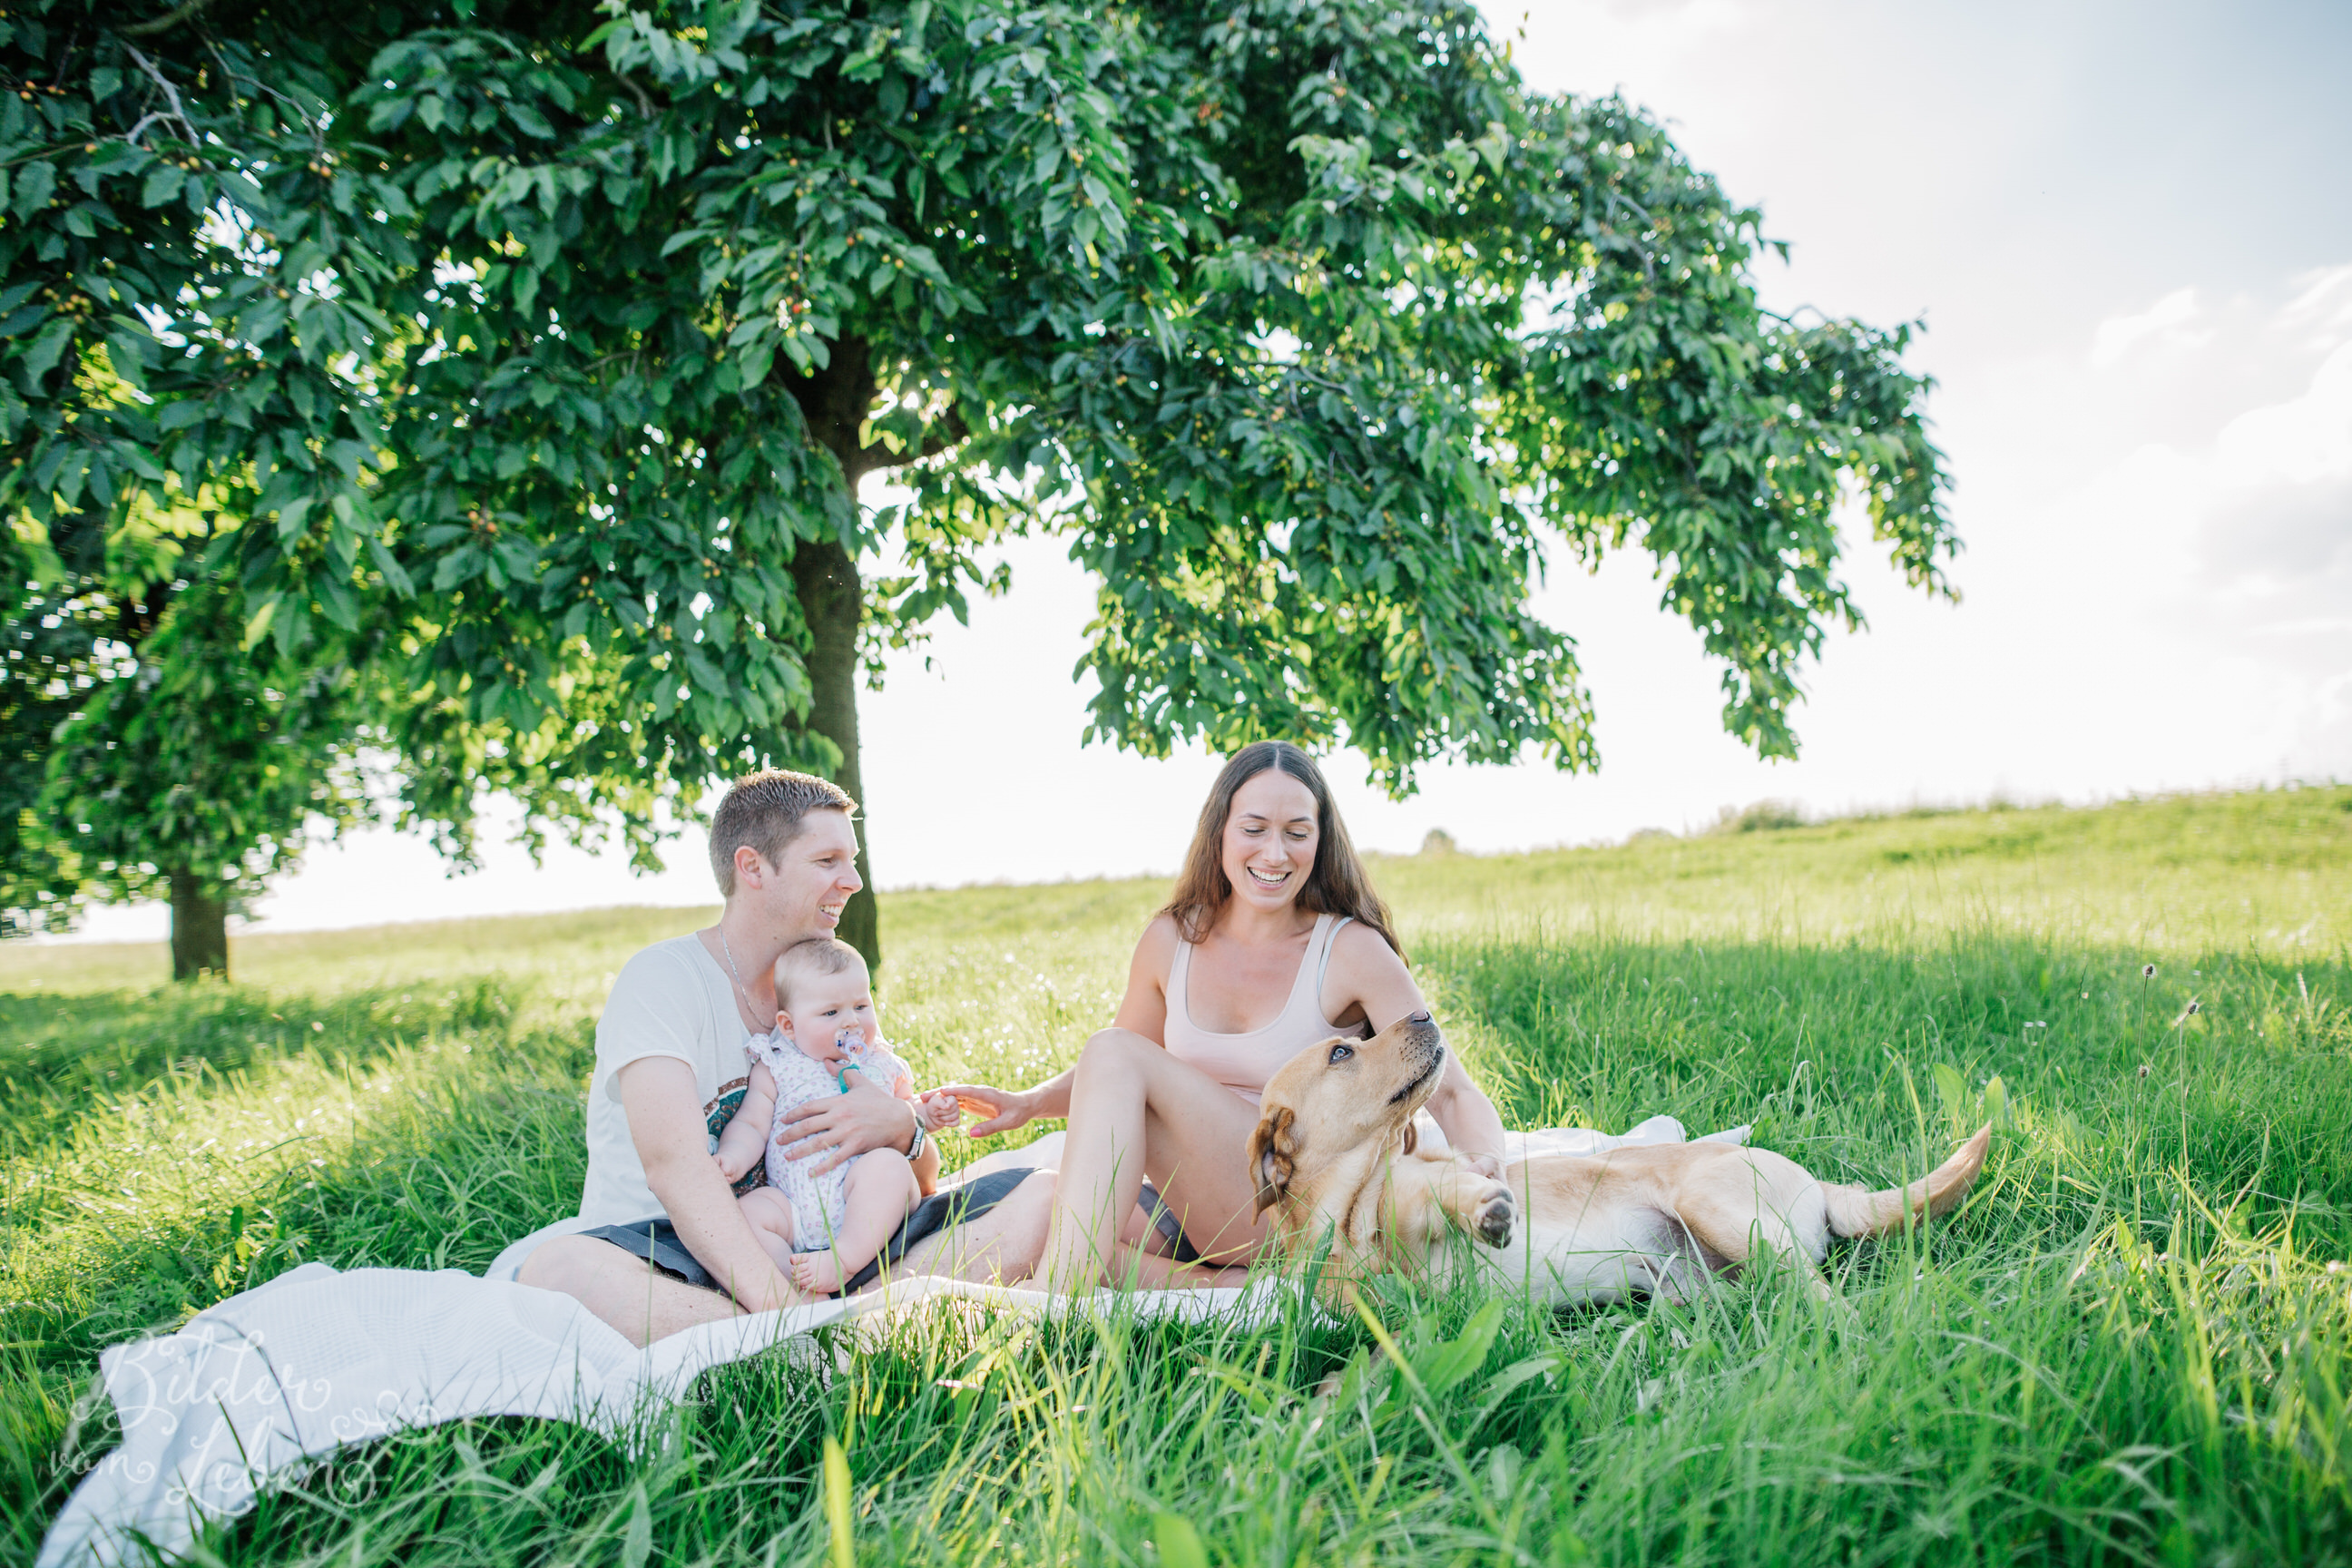 Greta-Labrador-Kinder-Portraits-BildervomLeben-2016-8024